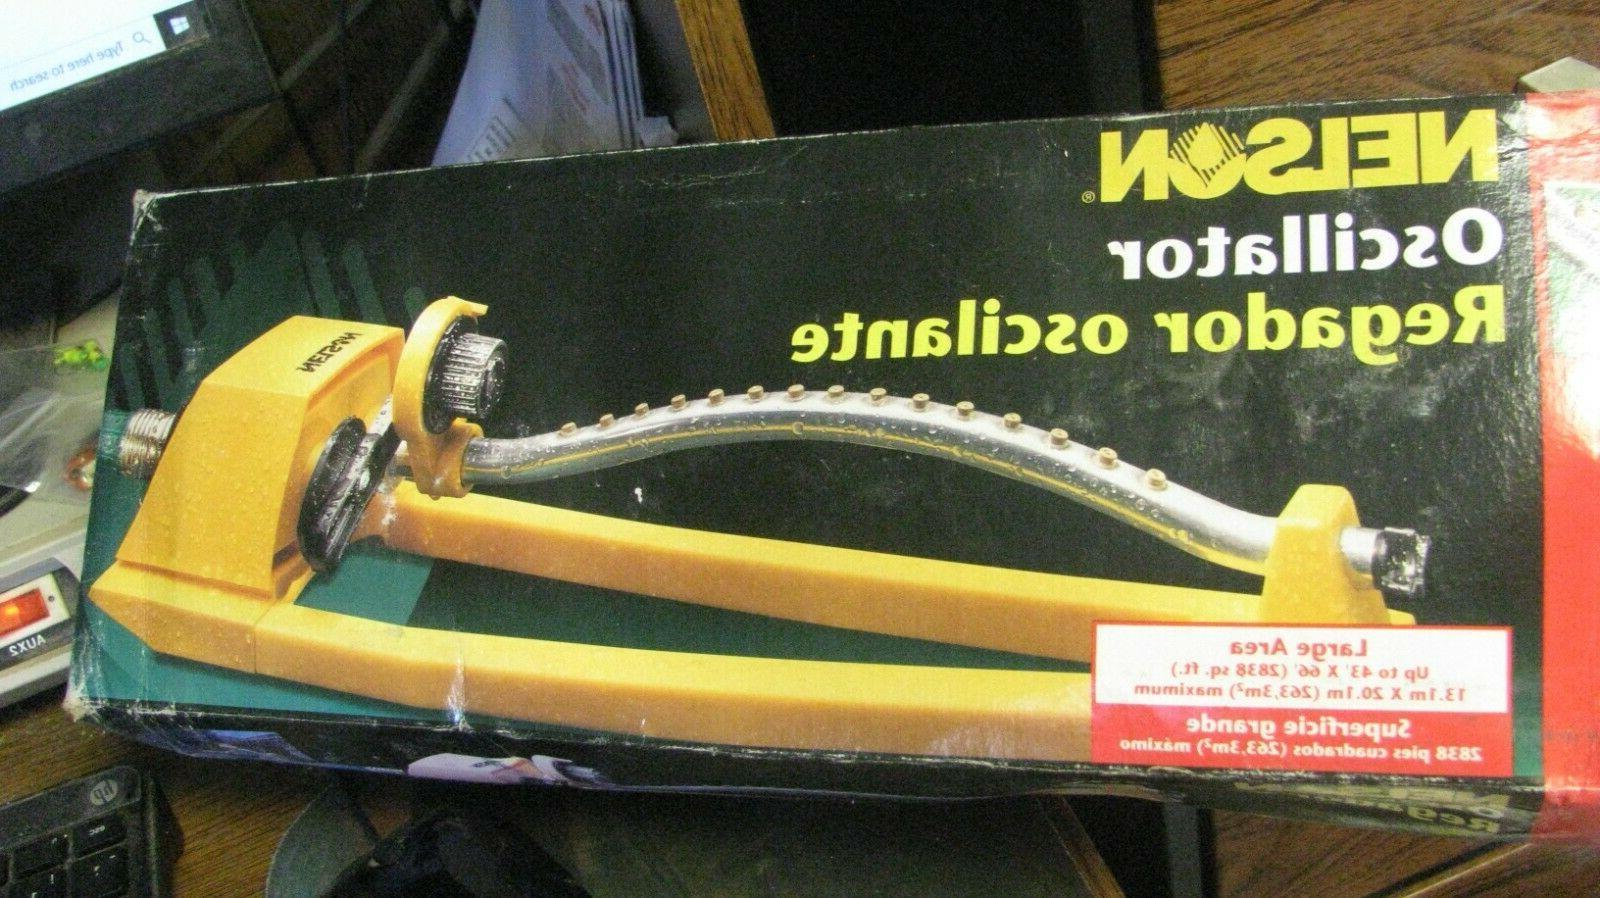 yellow oscillating lawn garden sprinkler 1025 2800